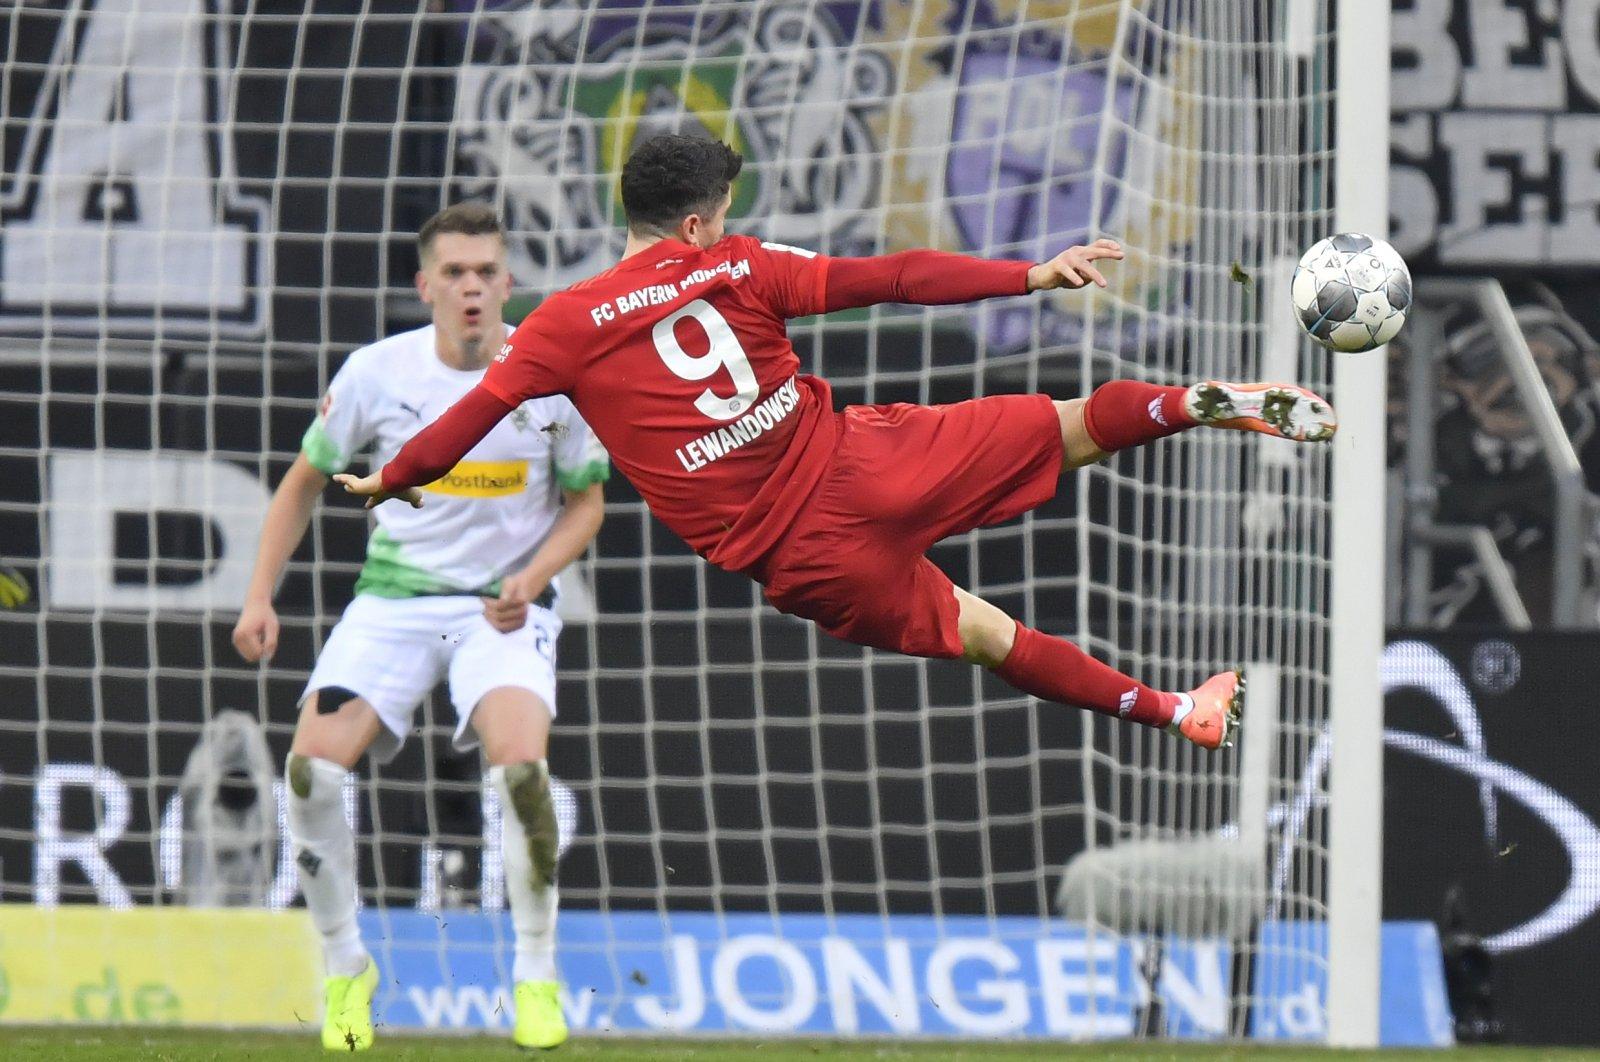 Bayern's Robert Lewandowski attempts a shot at the goal during a Bundesliga match in Moenchengladbach, Germany, Dec. 7, 2019. (AP Photo)